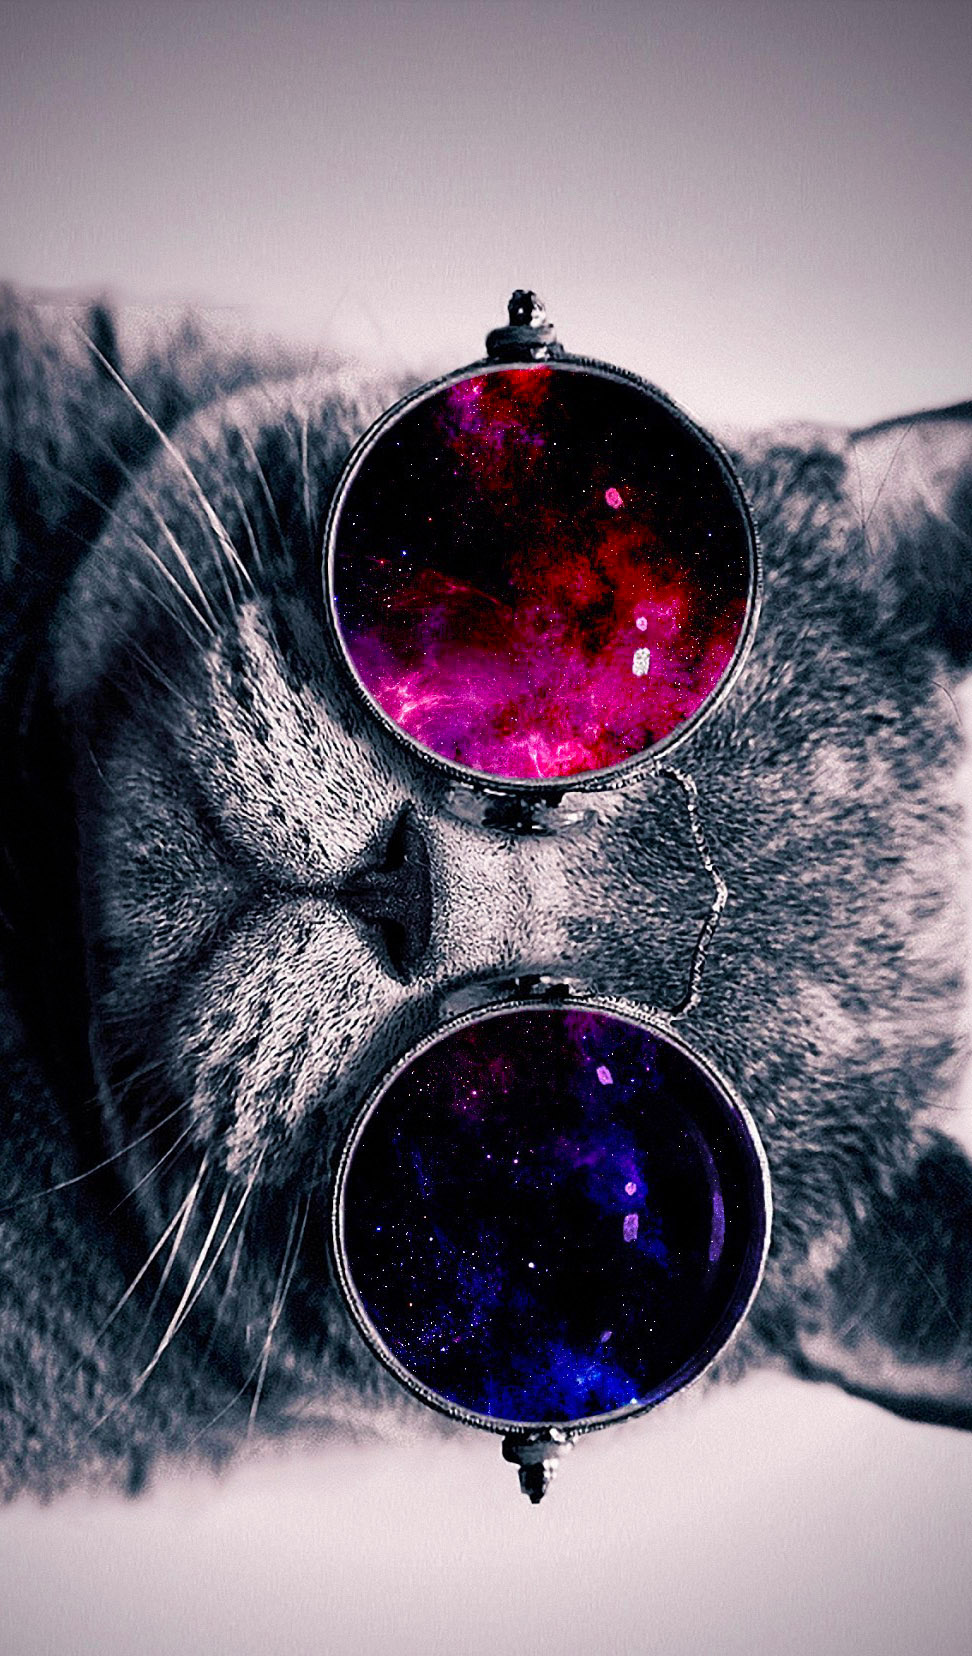 space cat iphone wallpaper wallpapers trendingspace 972x1656